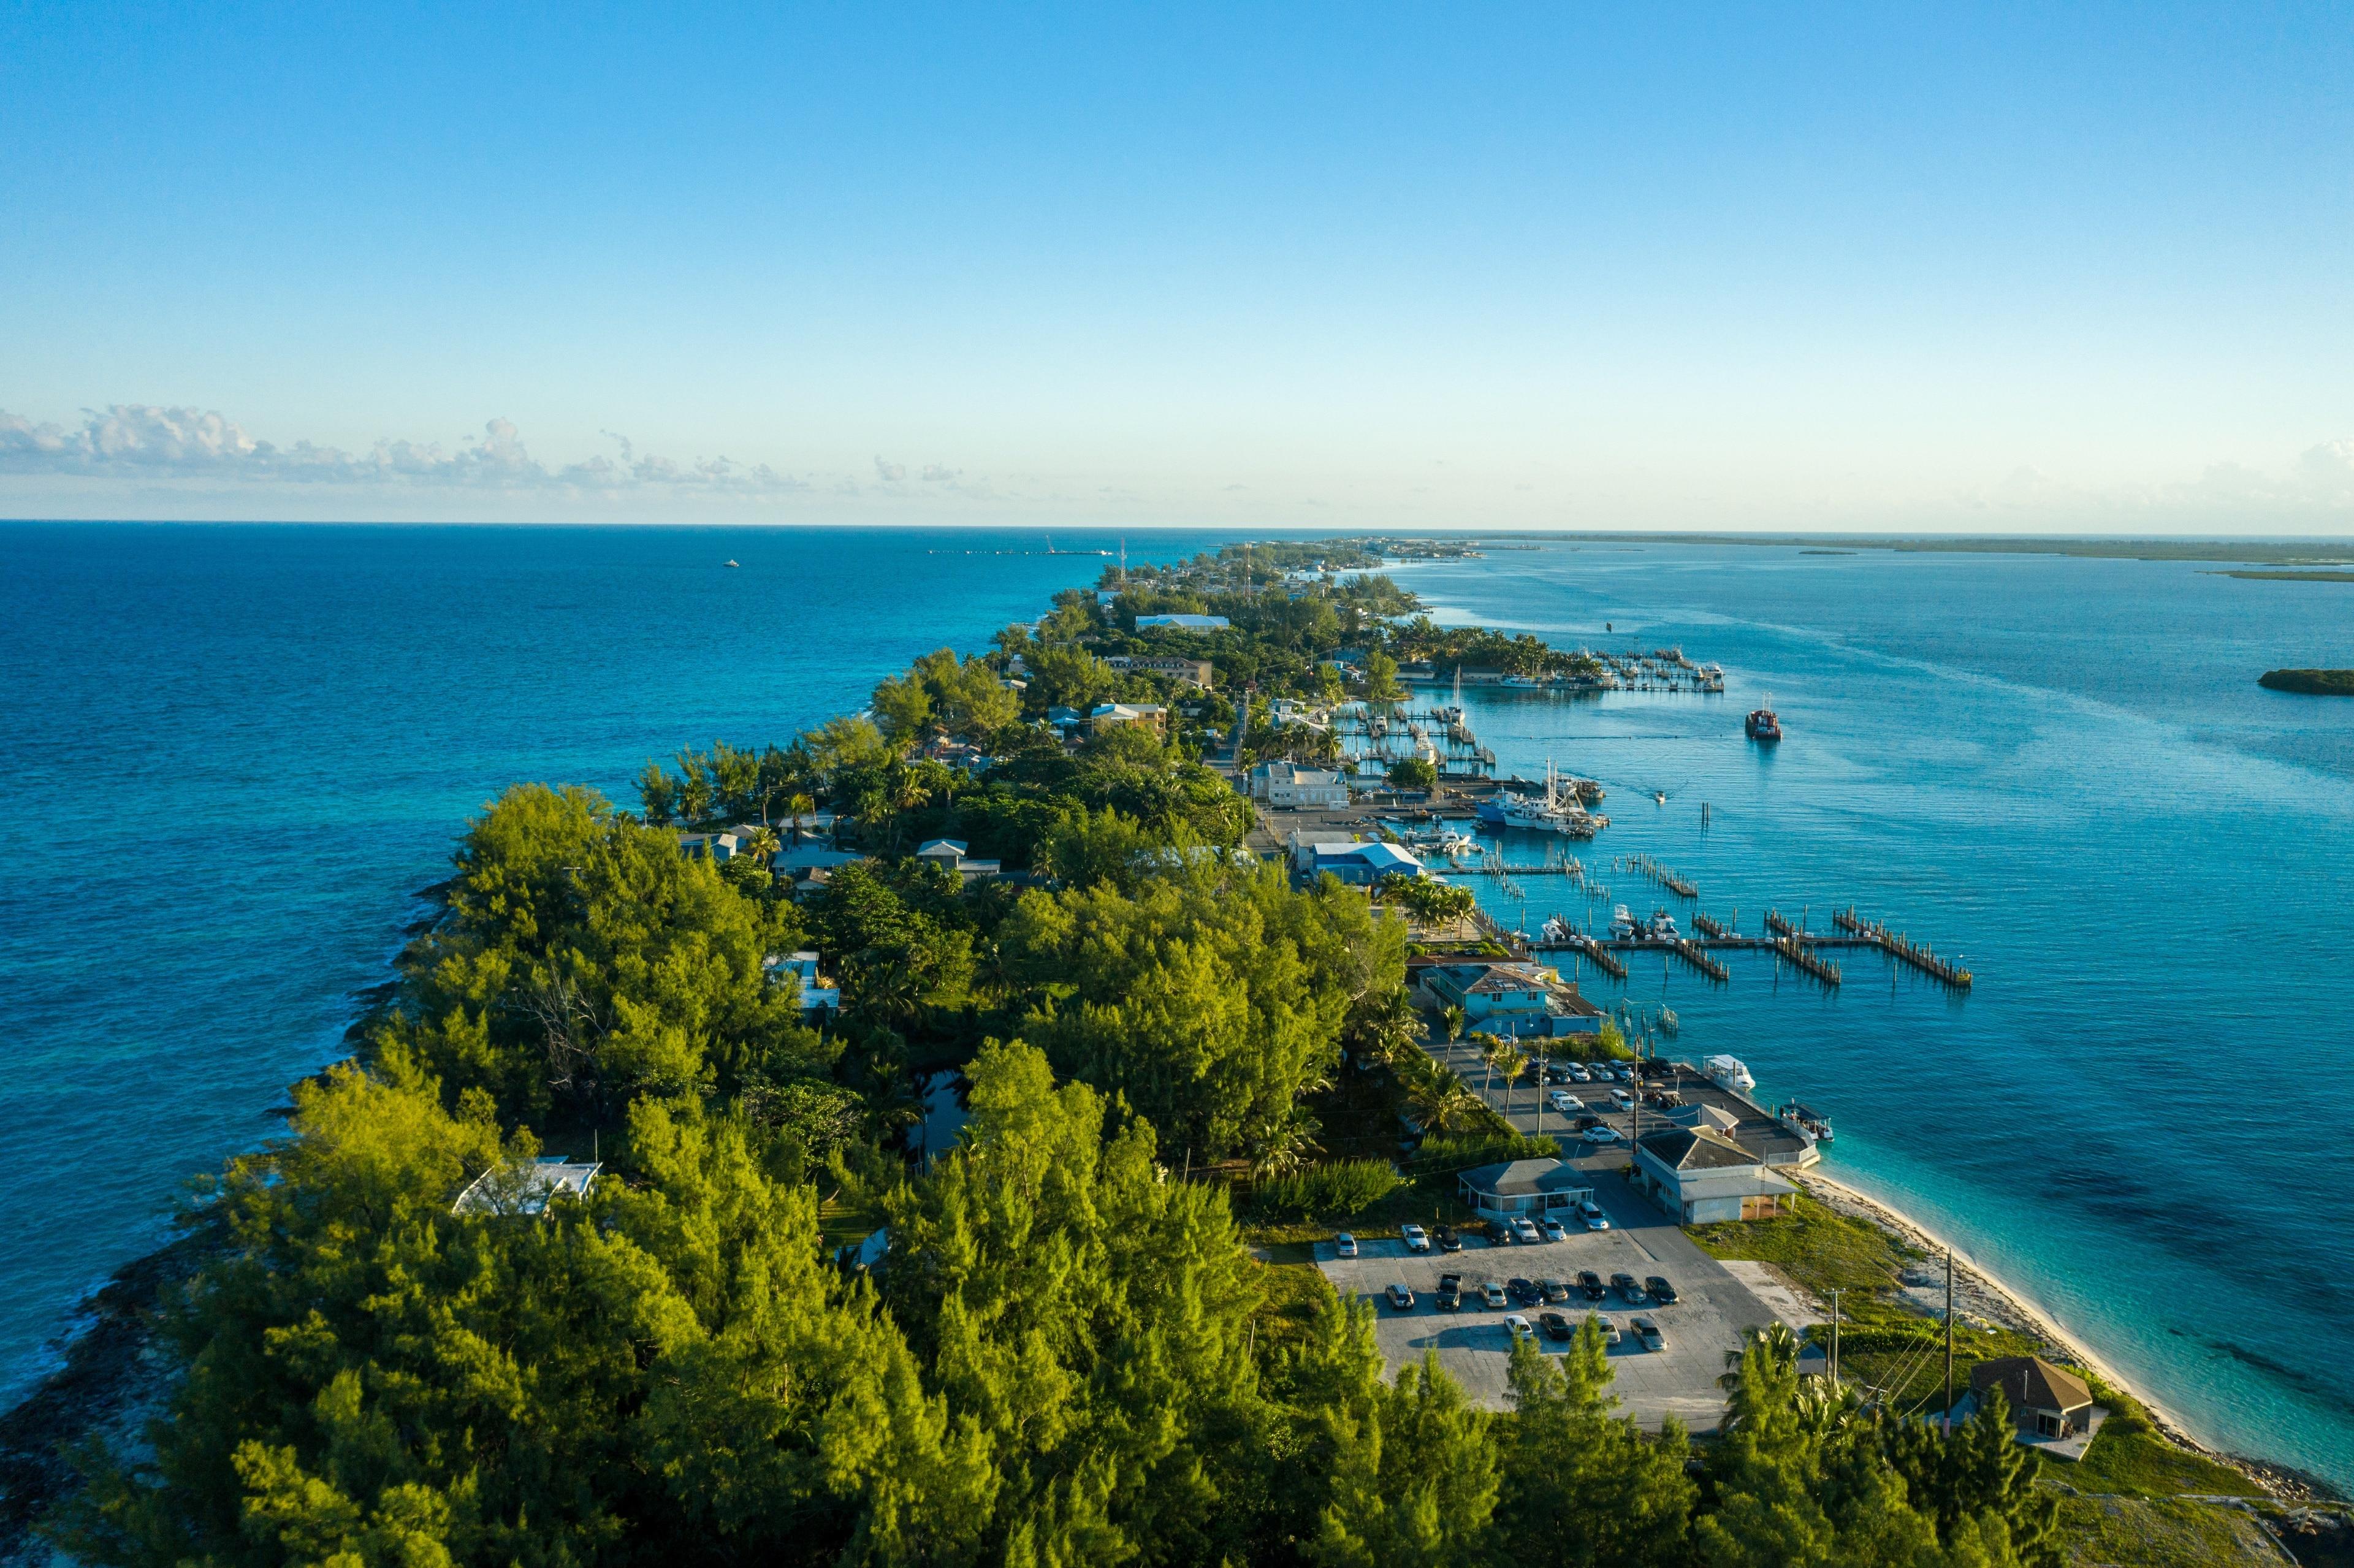 Alice Town, Bimini Islands, Bahamas